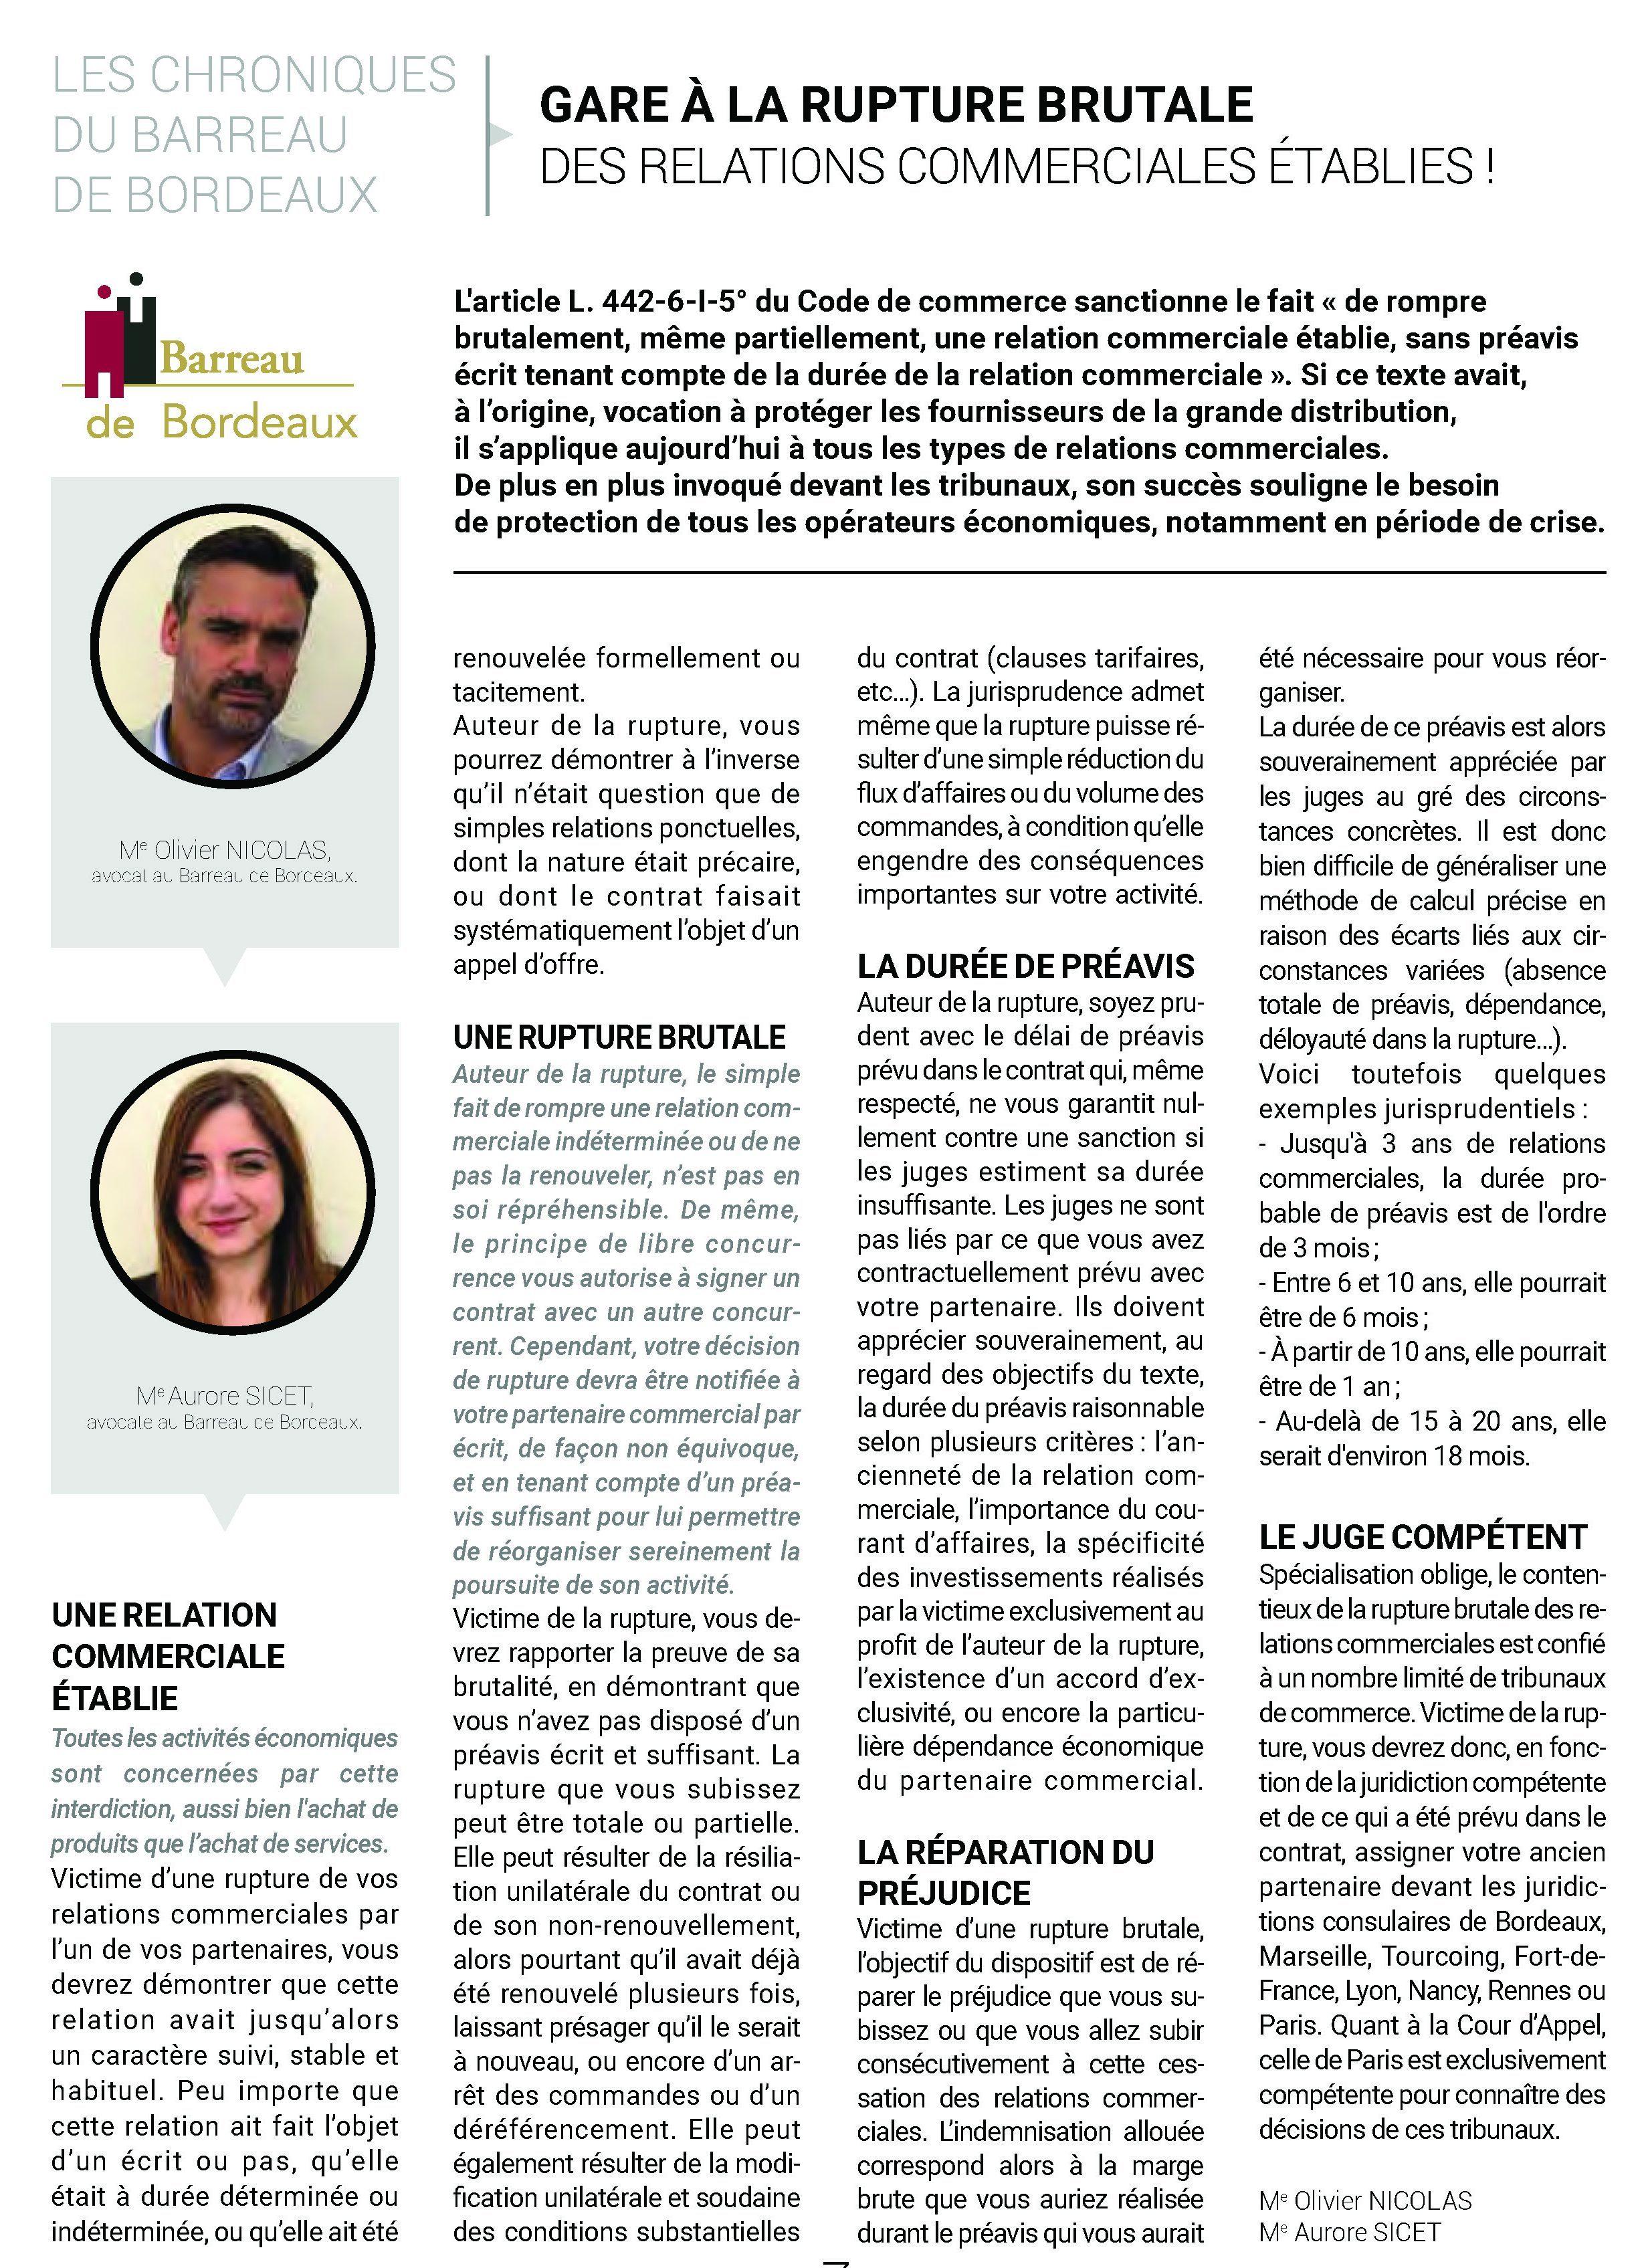 Les Echos Judiciaires Girondins LEXCO